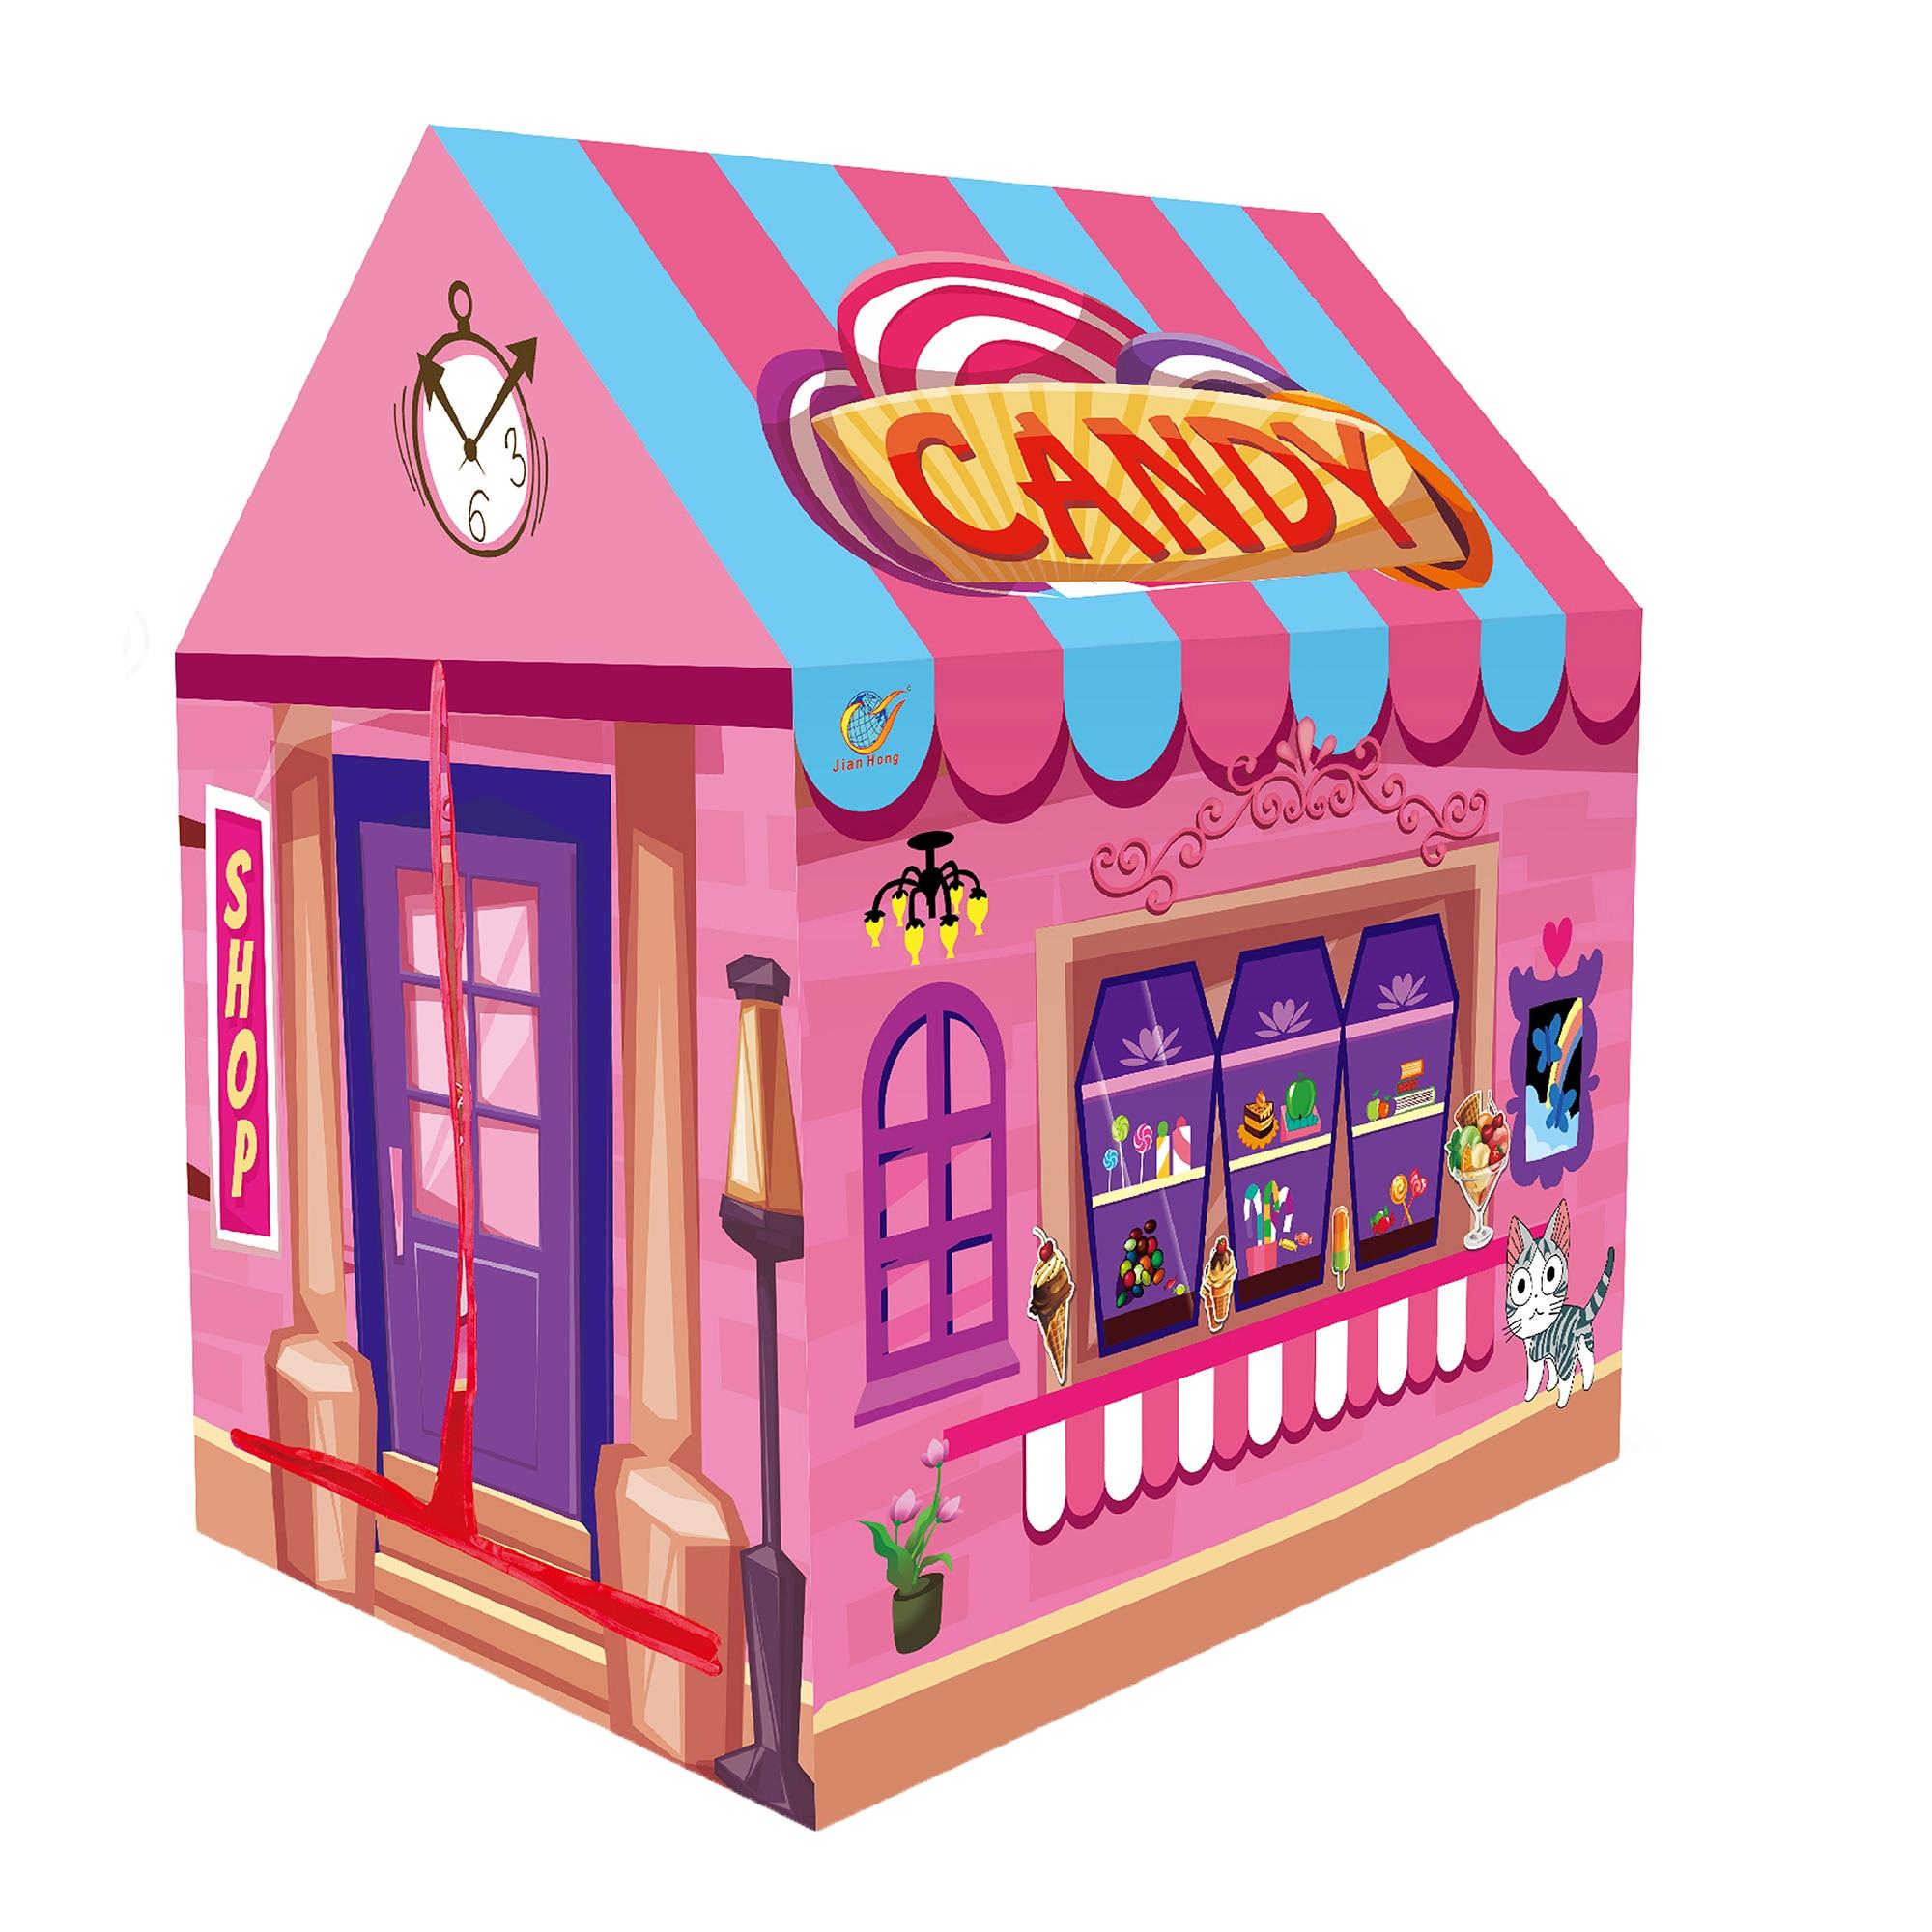 Fotografie Cort de joaca M-Toys Candy